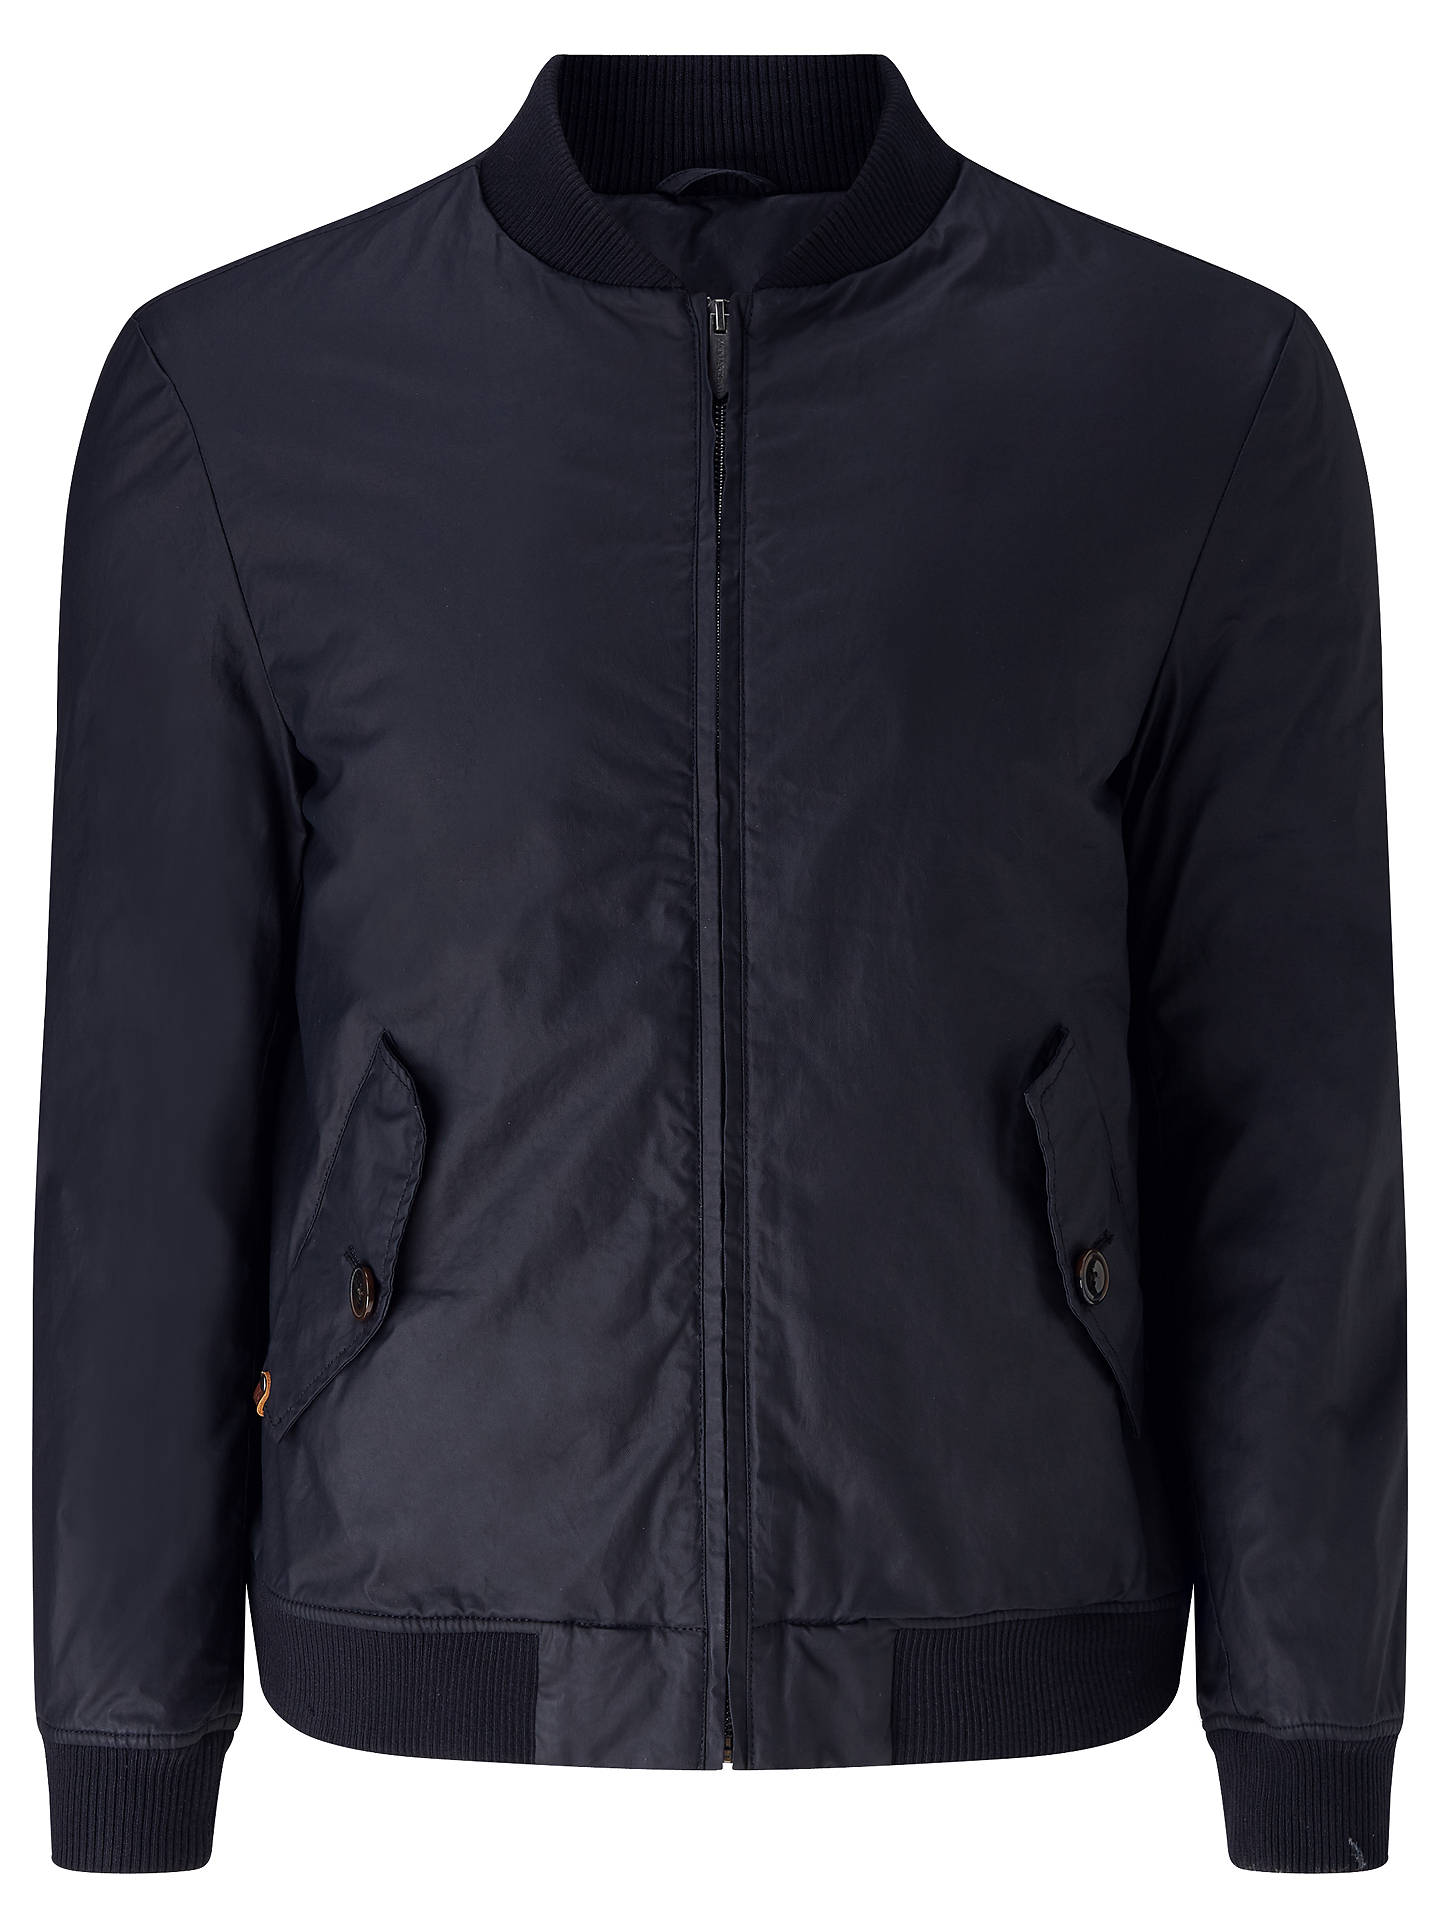 e7369d8bd JOHN LEWIS & Co. Waxed Cotton Bomber Jacket at John Lewis & Partners